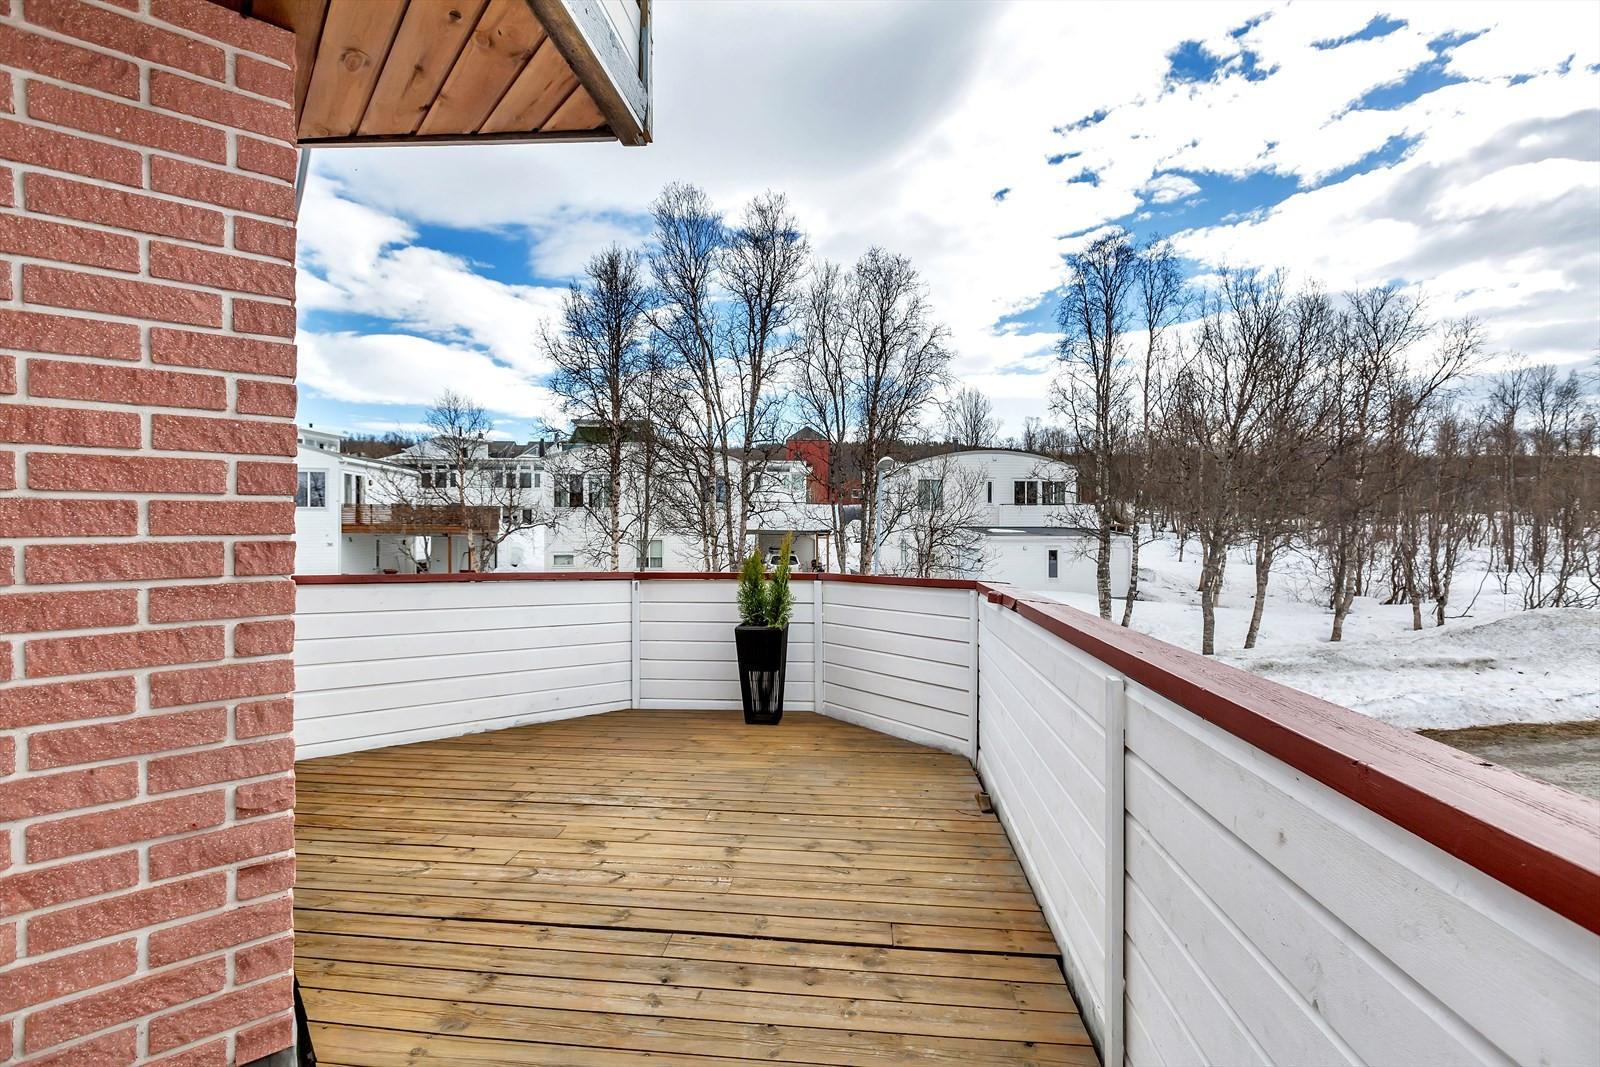 Fra stuen er det utgang til en romslig og nyoppusset balkong med gode solforhold.